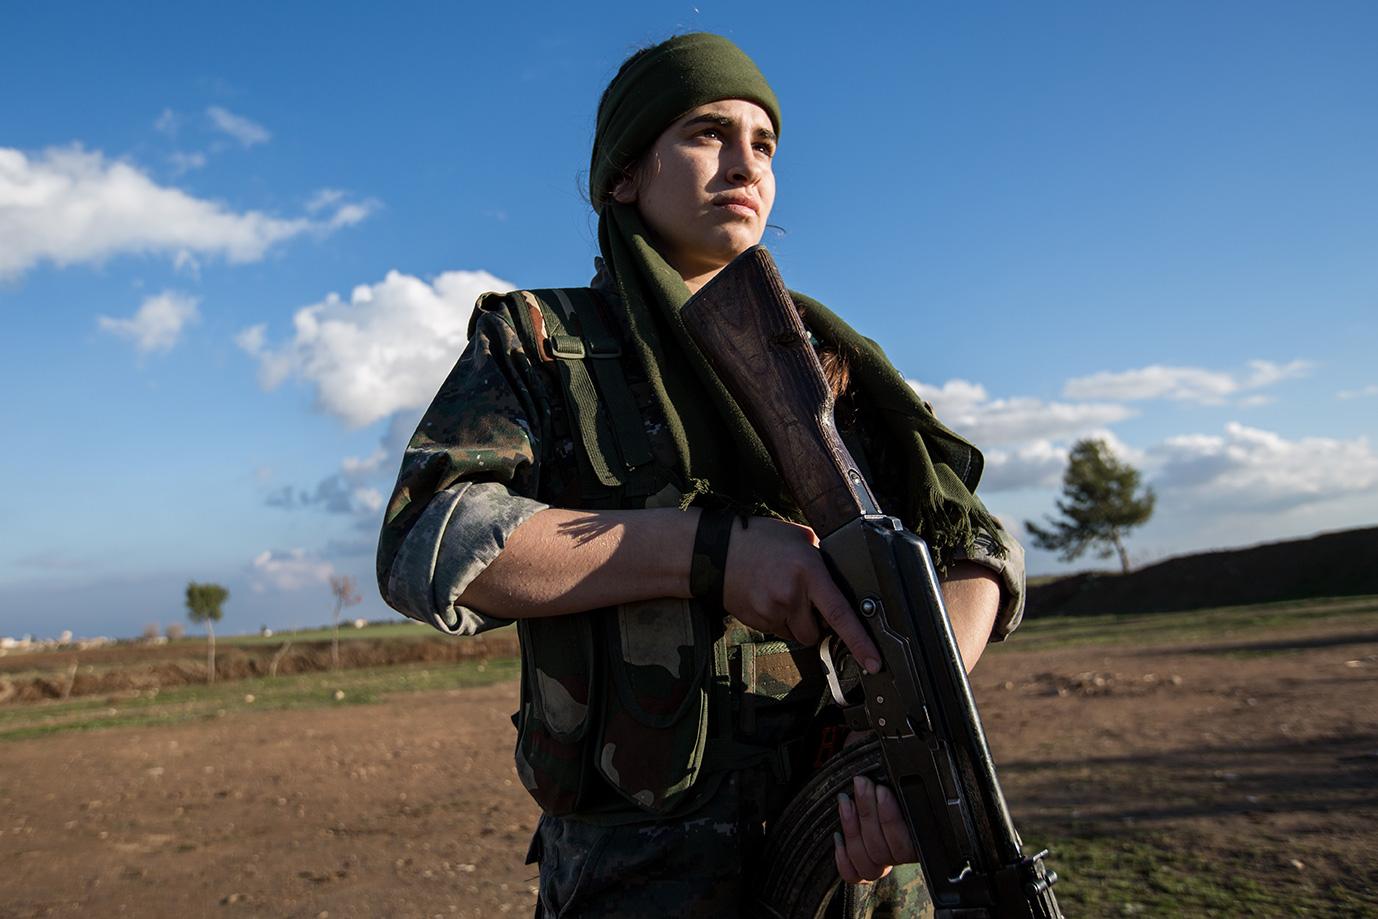 yesidi woman preparing fight isis